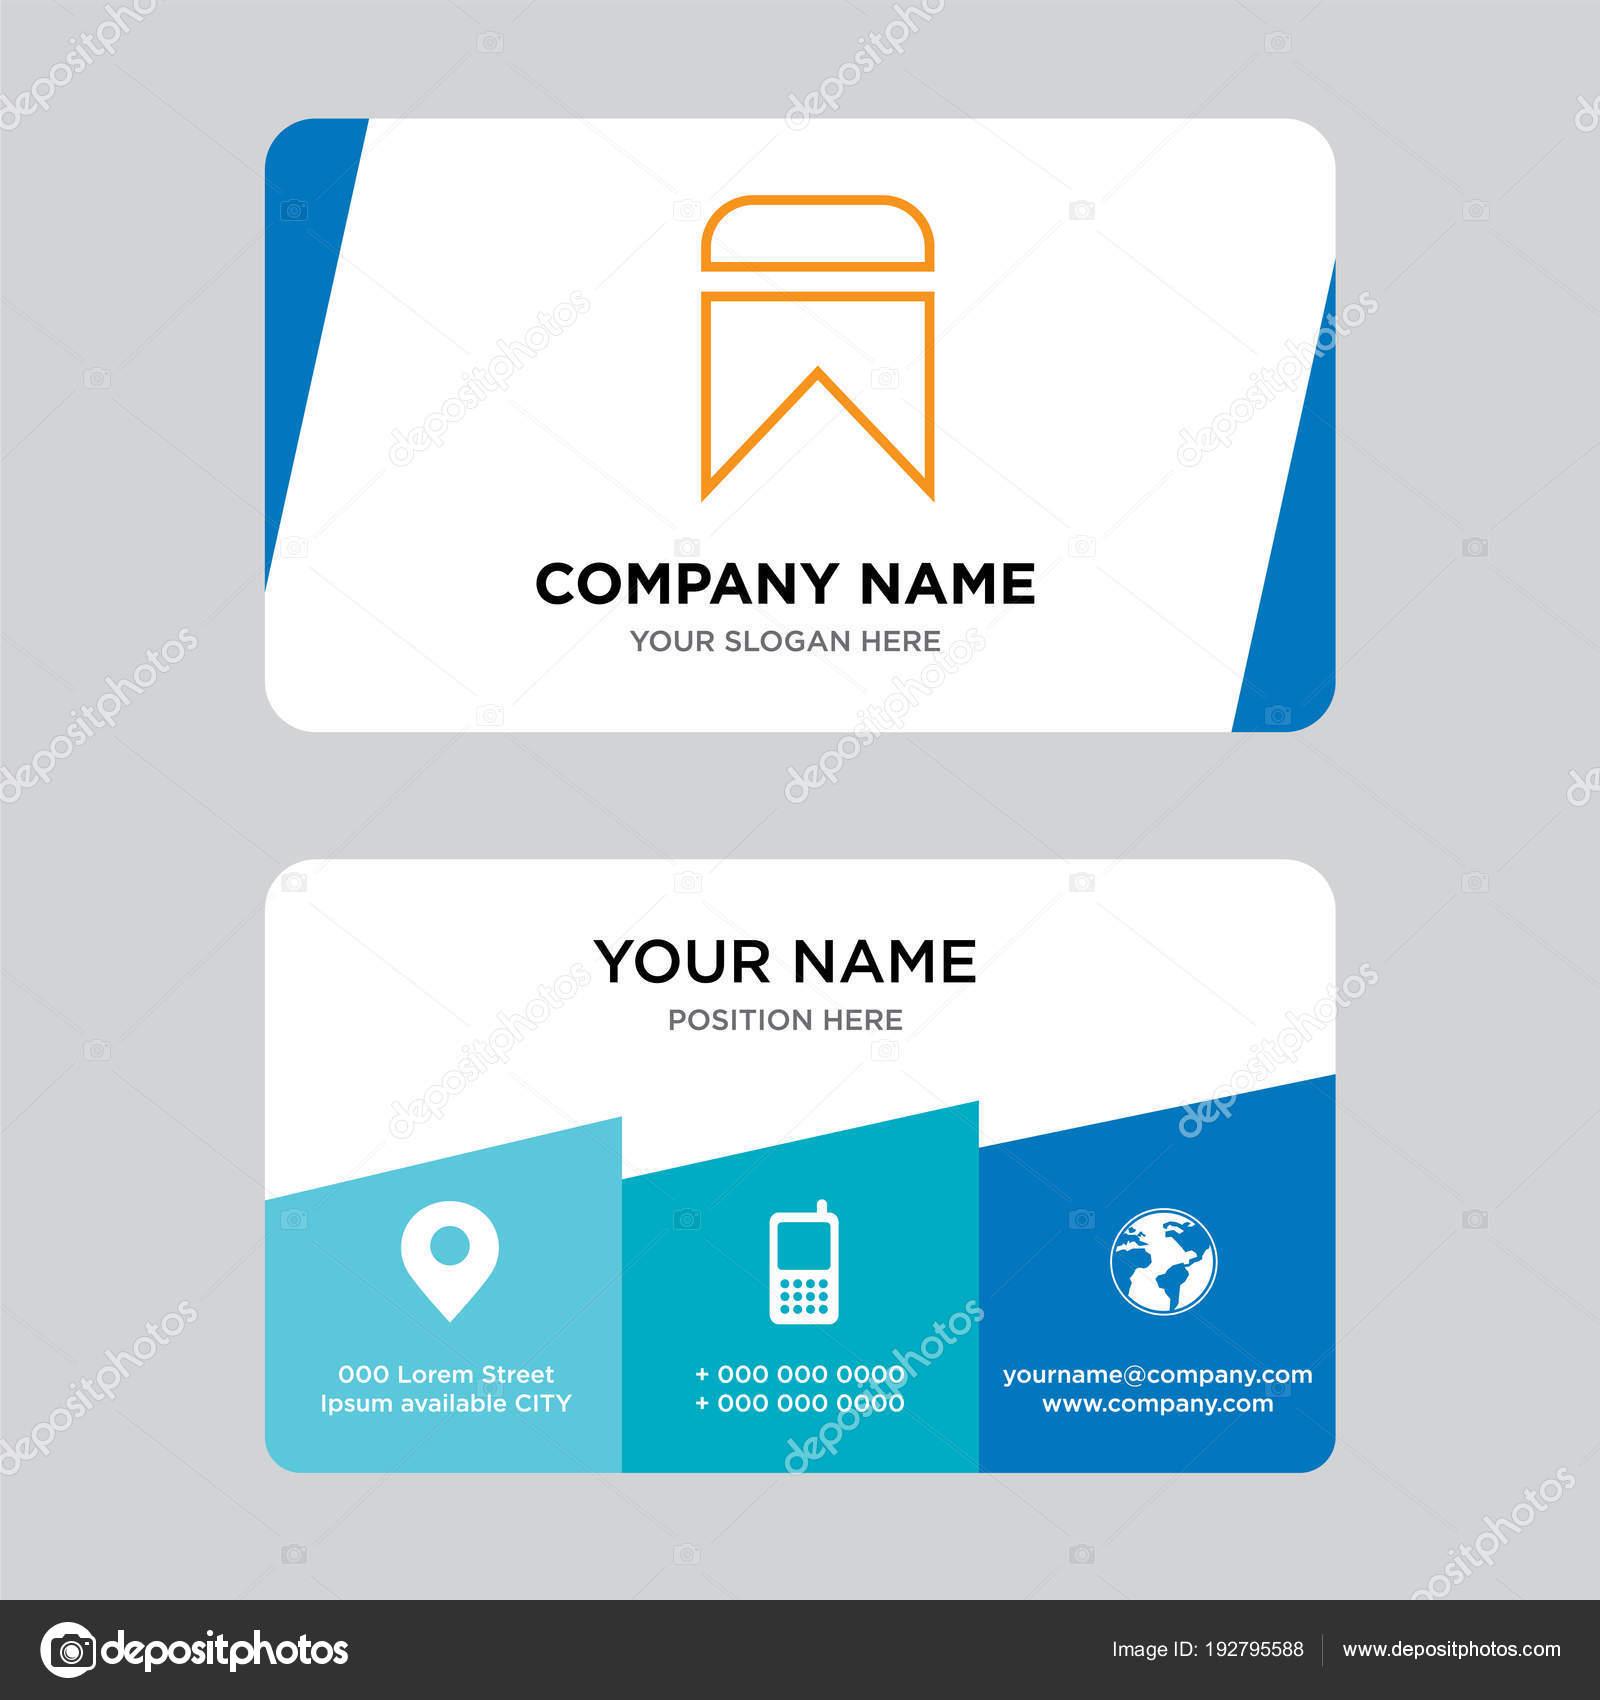 Bookmark business card design template stock vector bookmark business card design template stock vector colourmoves